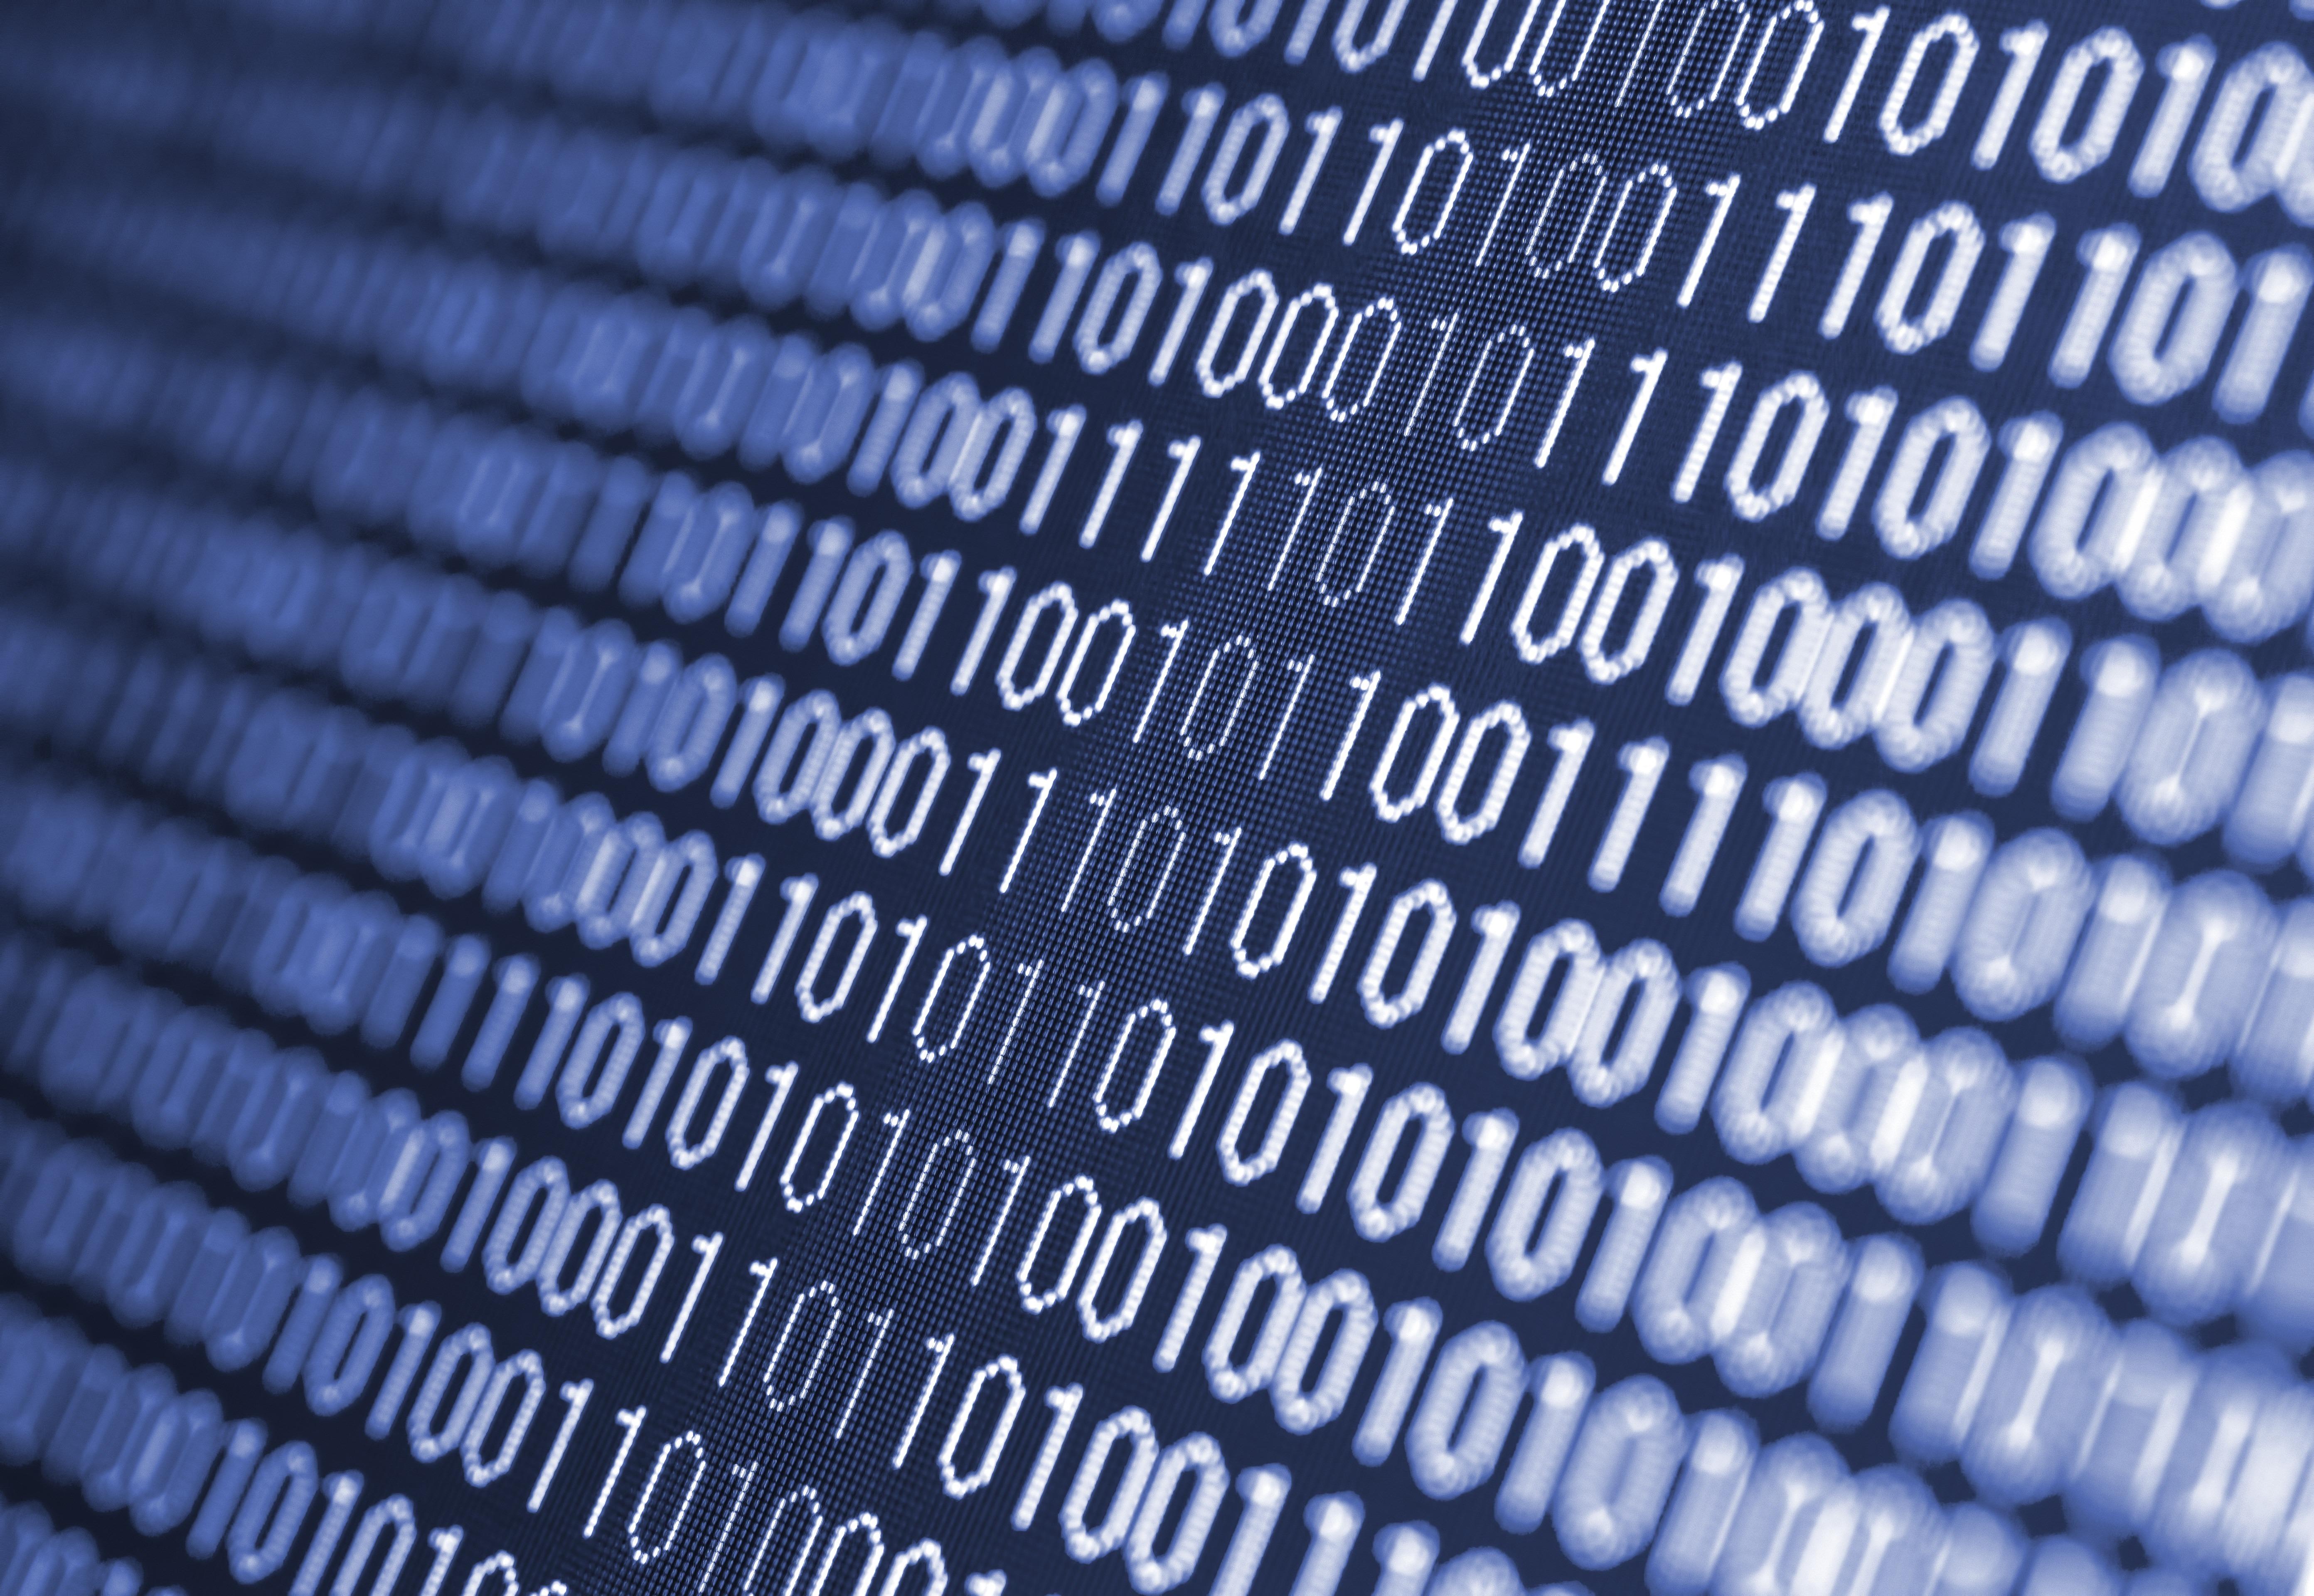 AI・コンピューター・パソコン・computer・IT情報化社会